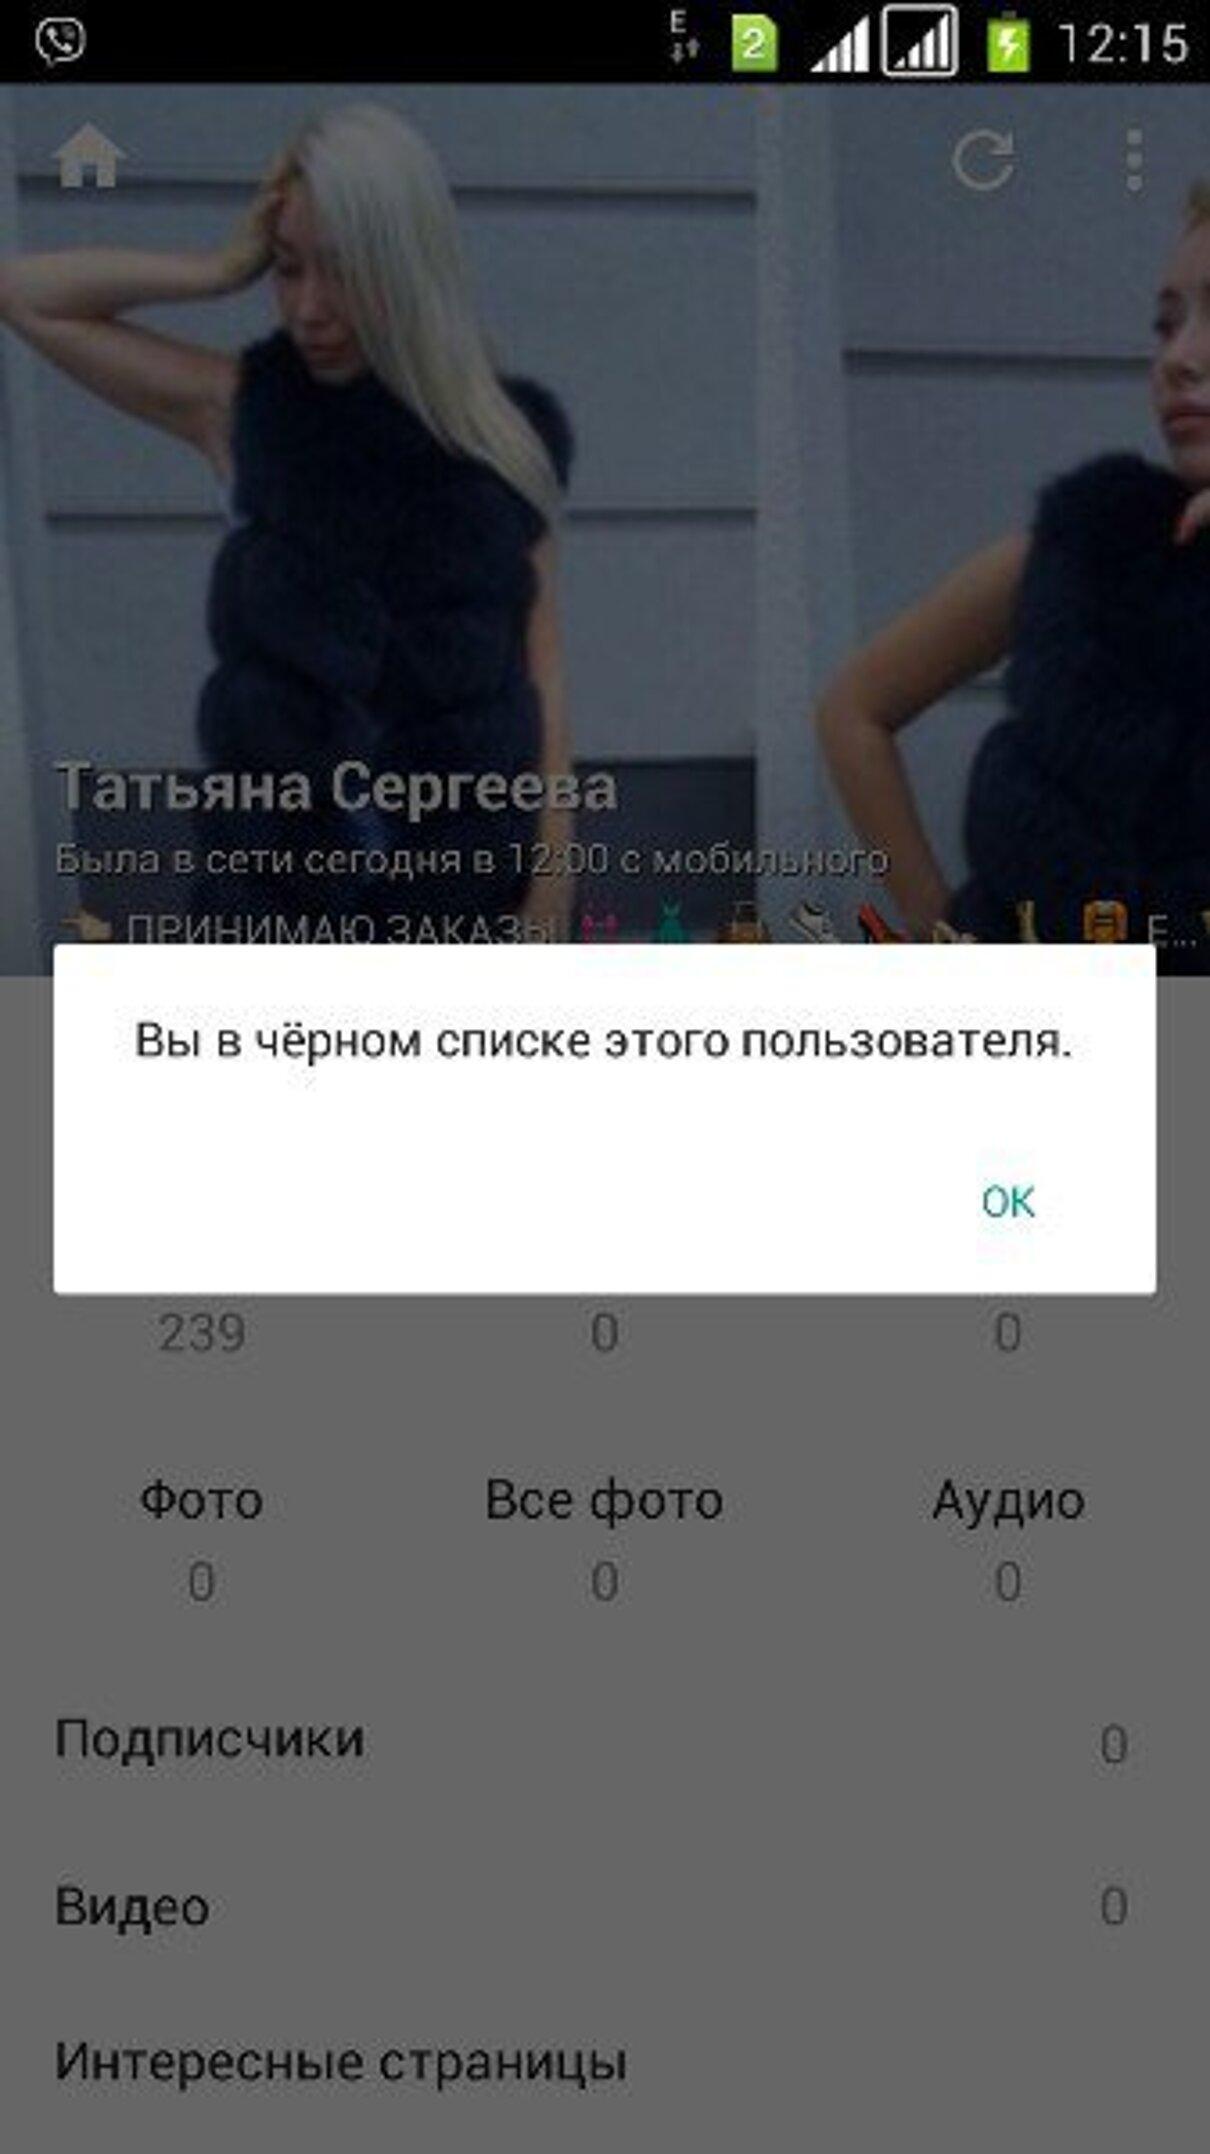 Жалоба-отзыв: 4188373027305108 Татьяна Проснякова - Мошенница.  Фото №3